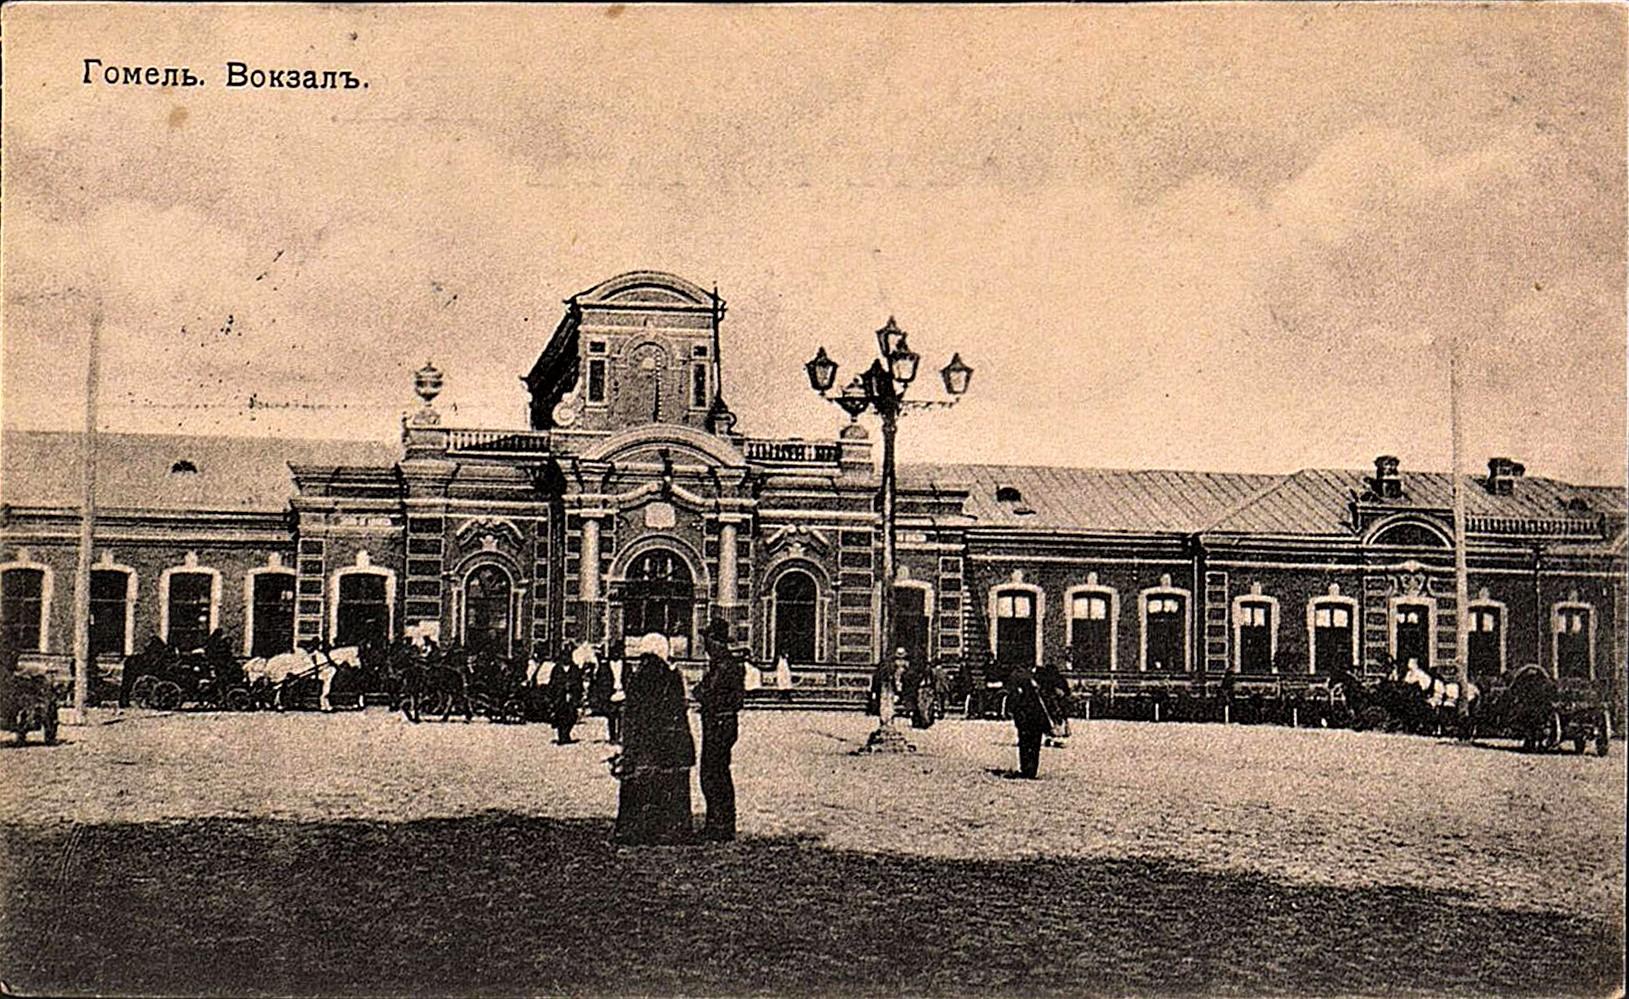 Гомель 1901 г.